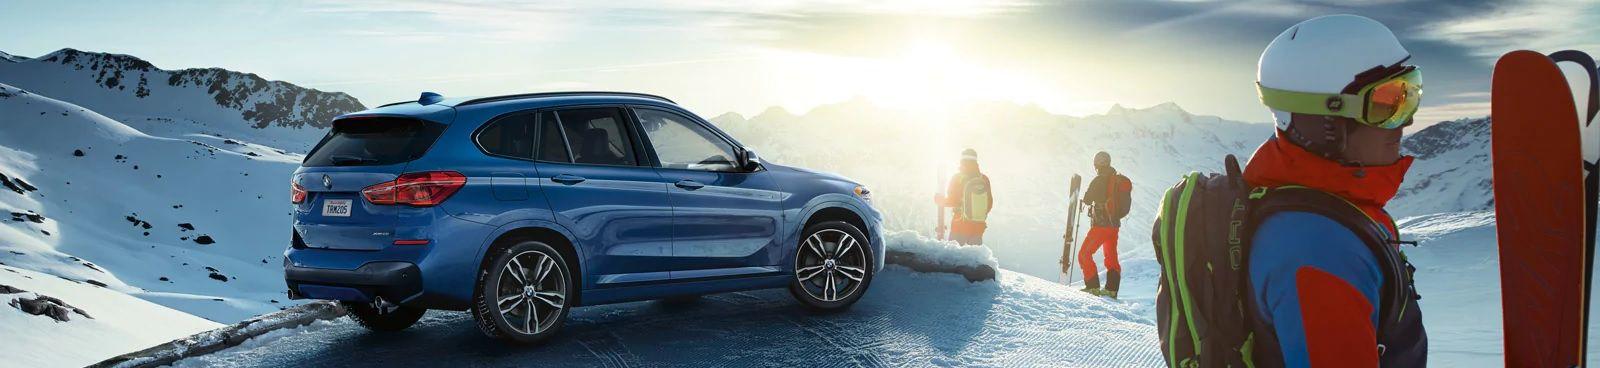 2019 BMW X1 for Sale near Gary, IN